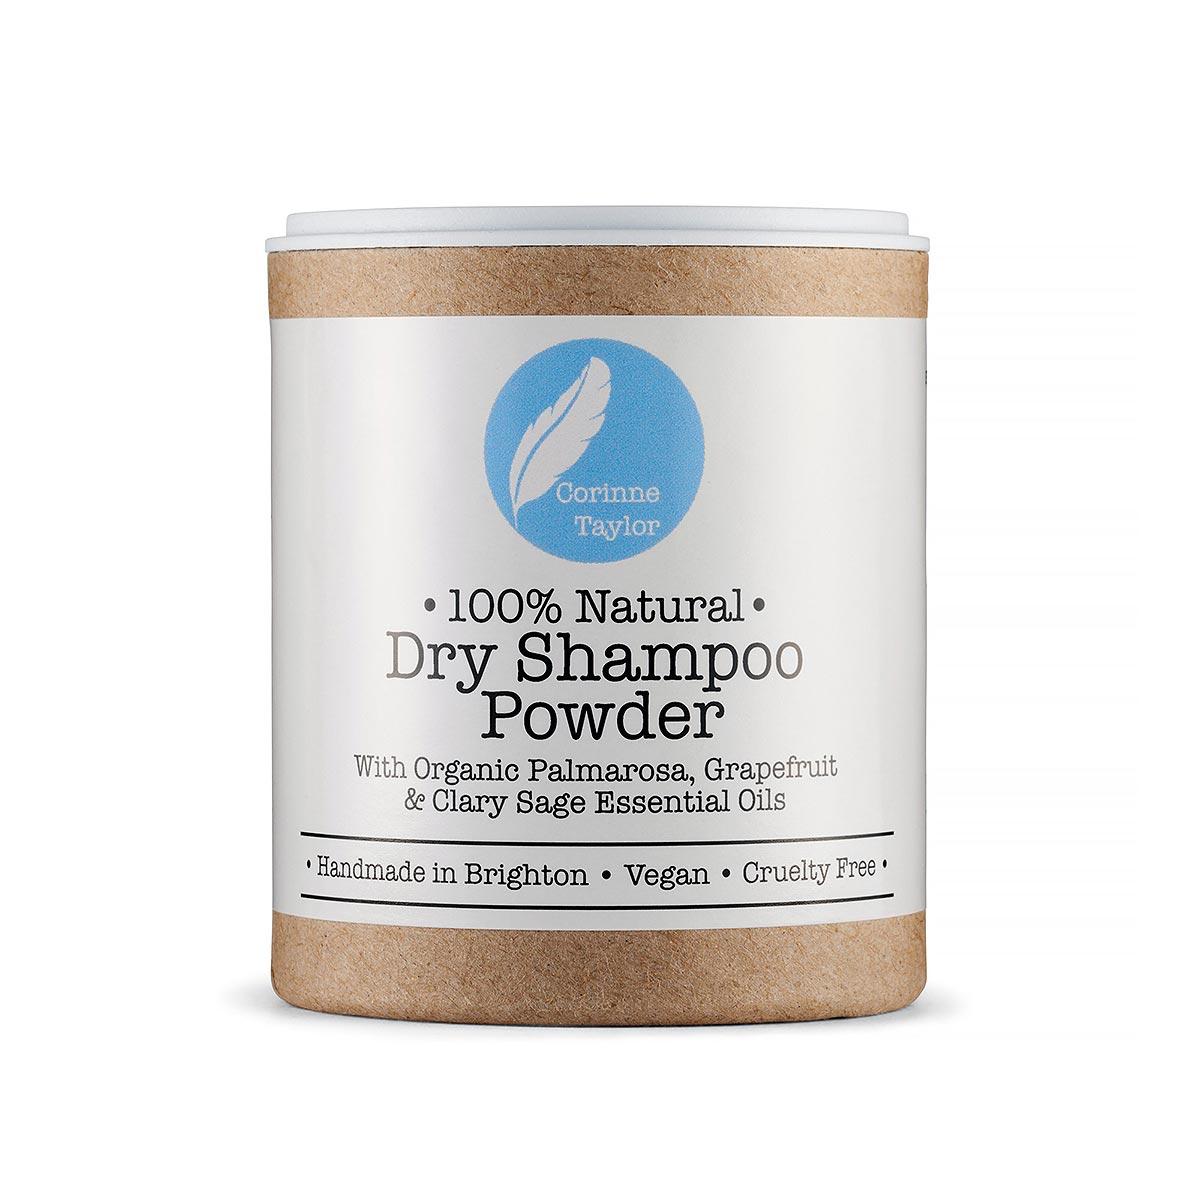 powder in box on white background